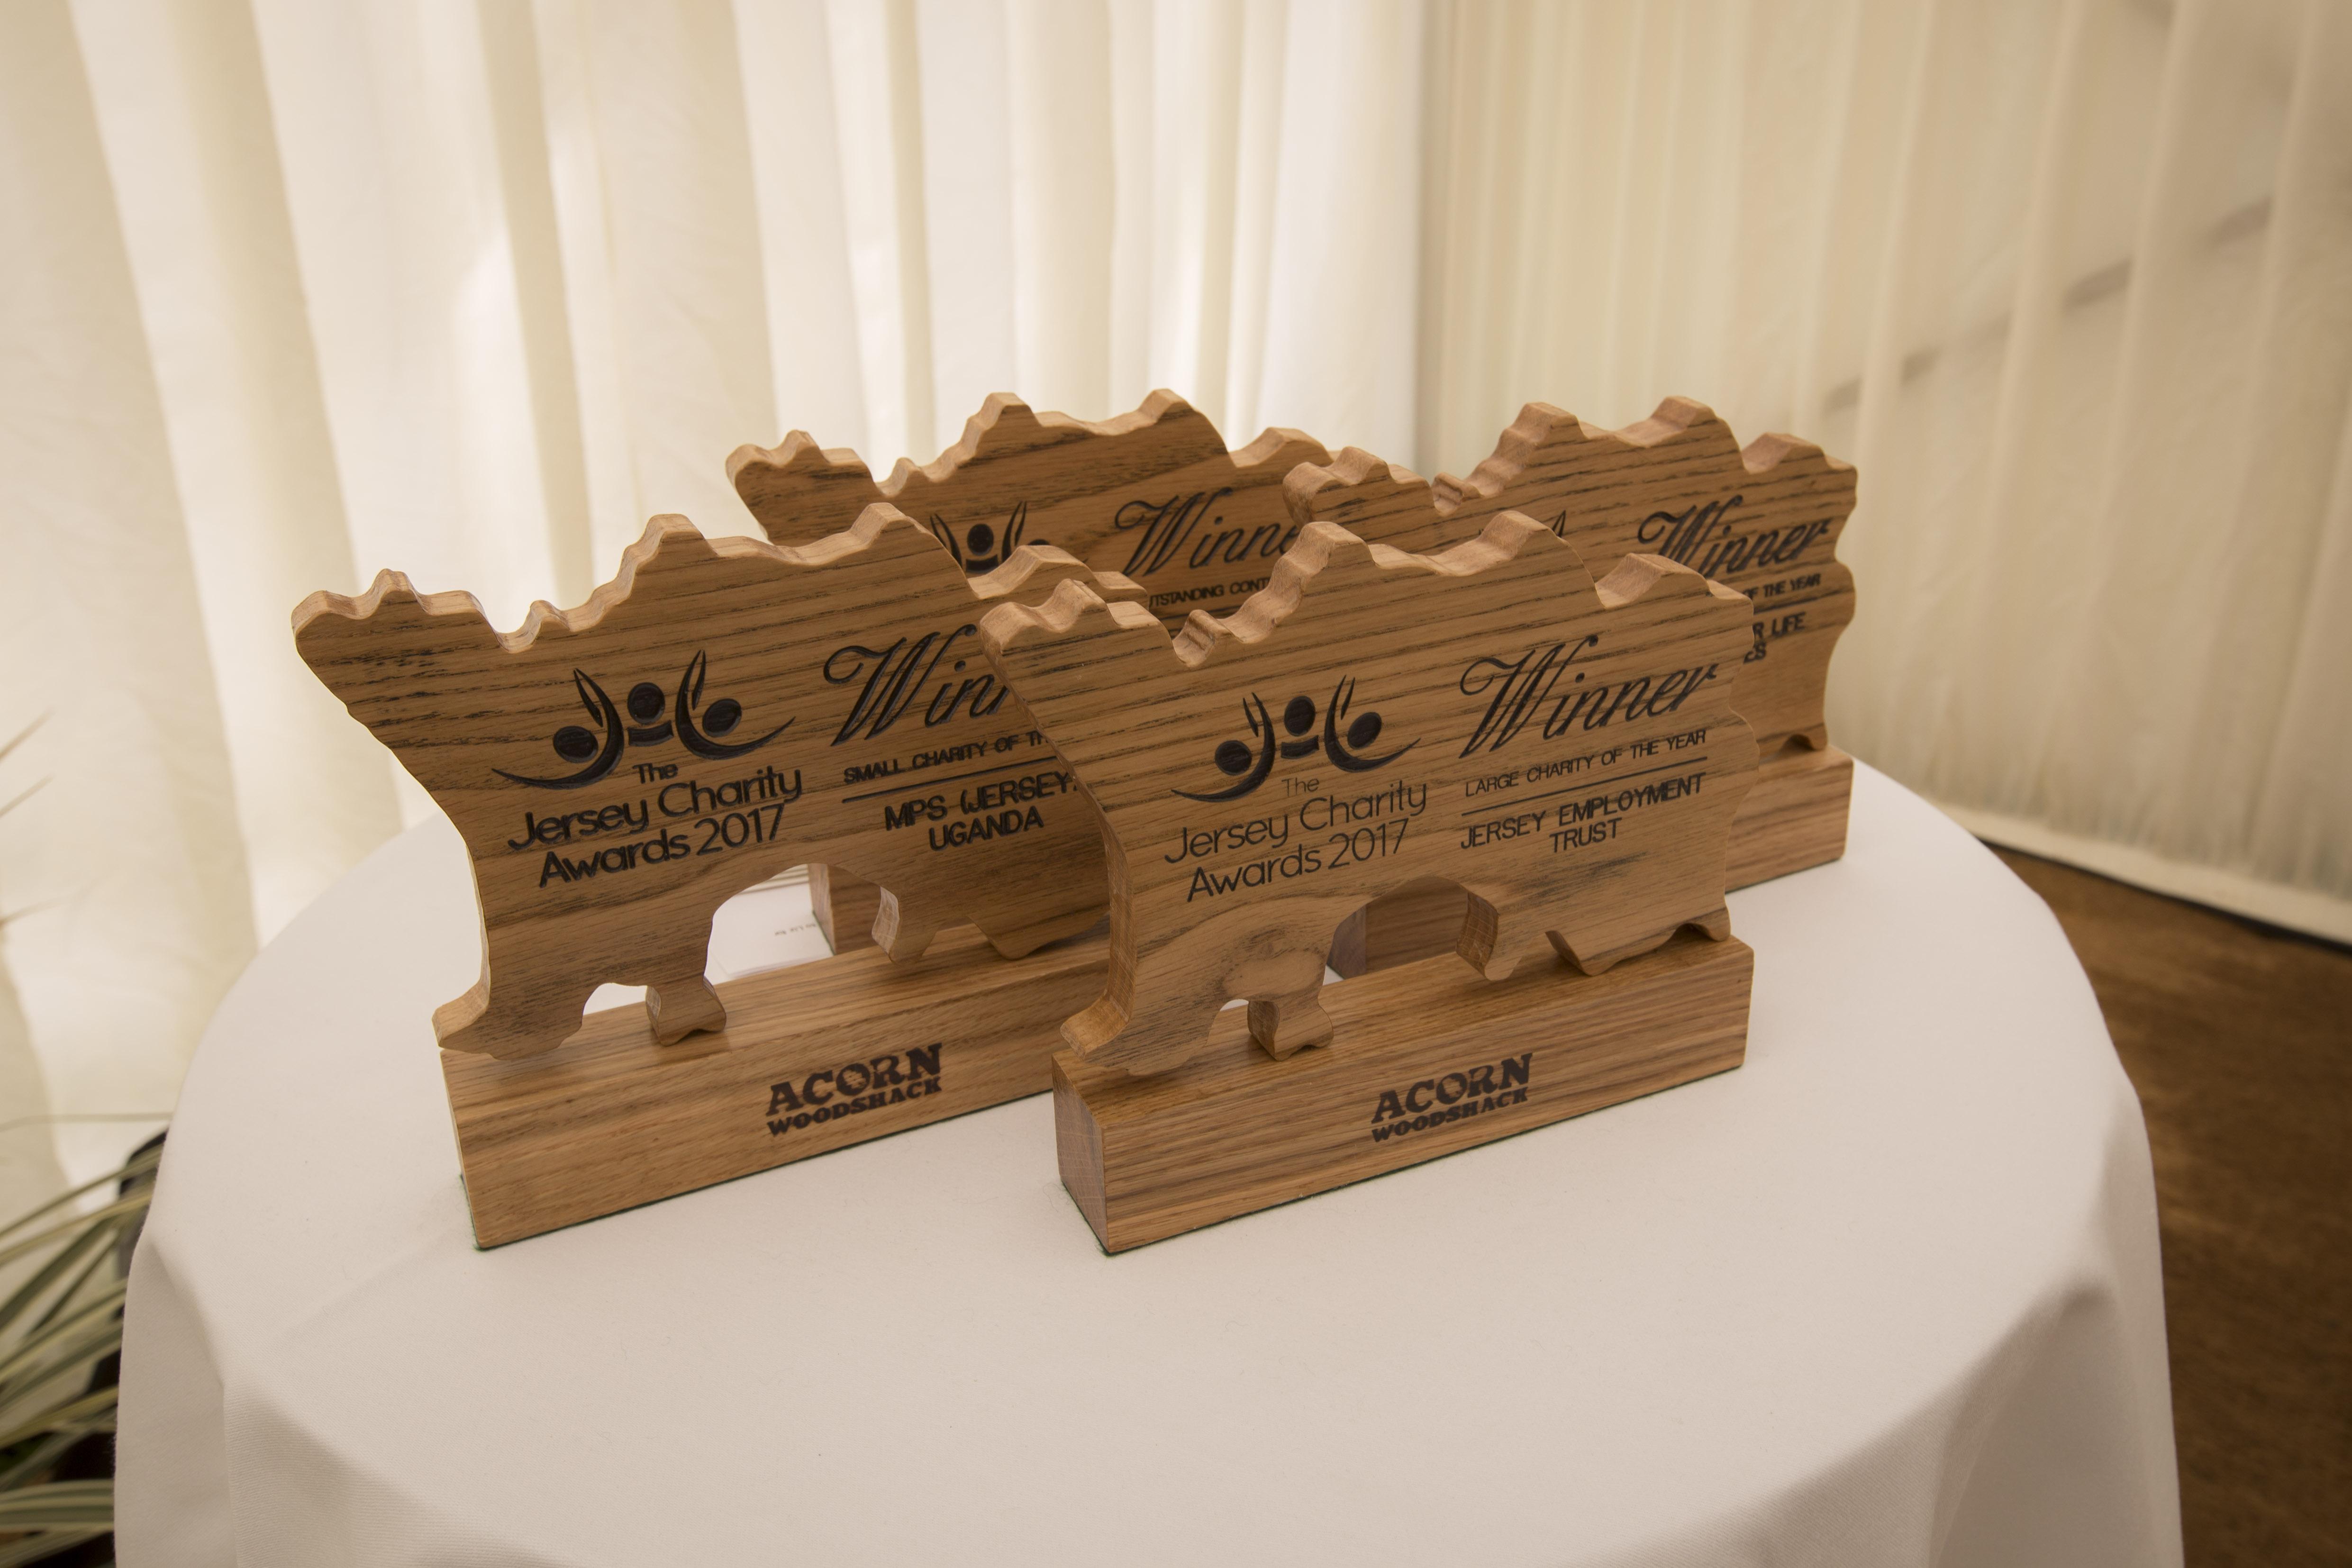 JCA Award trophies 2017